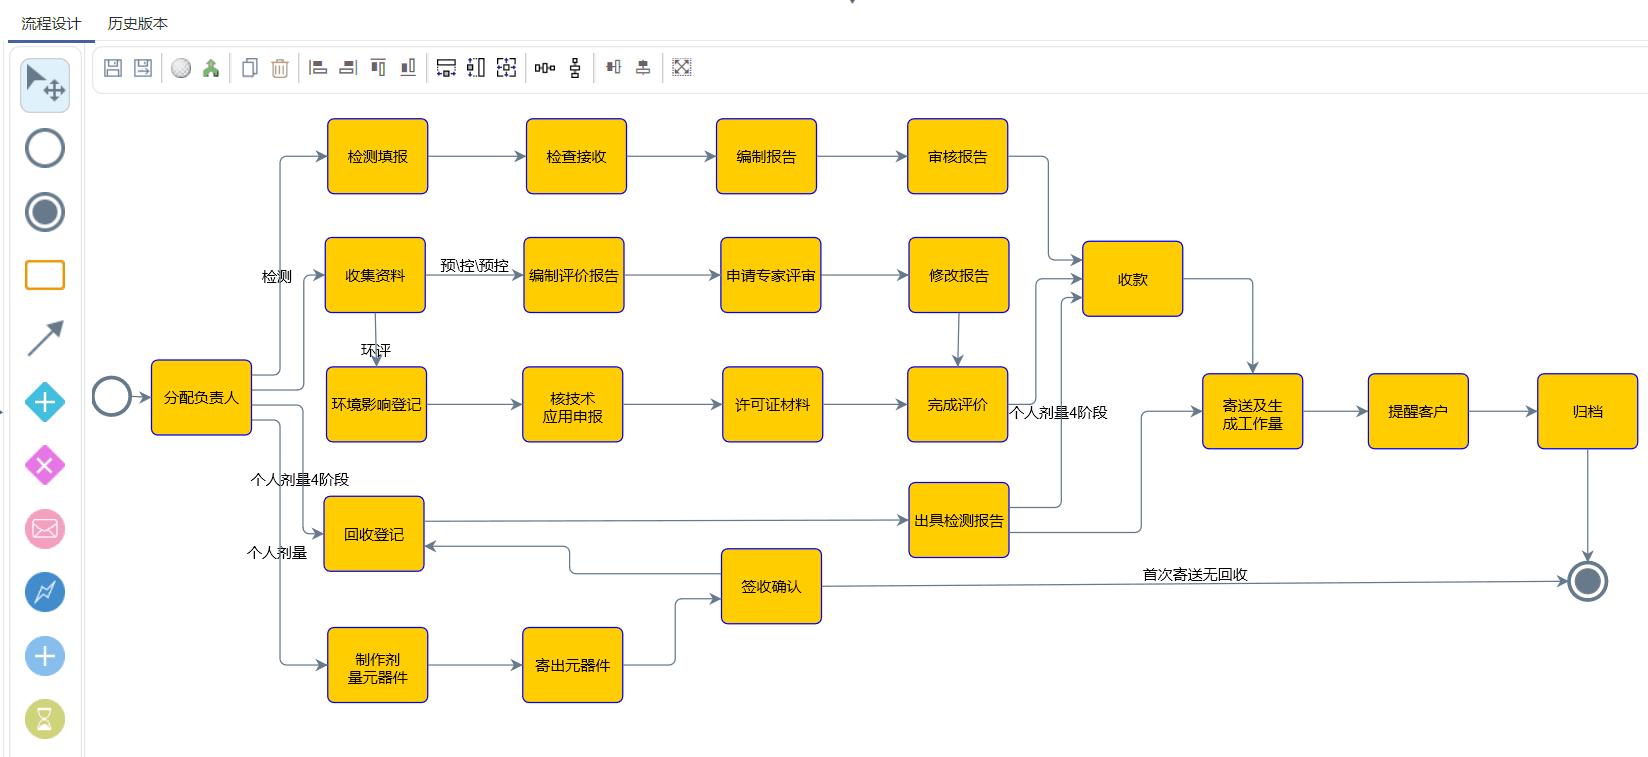 <b>检测服务行业系统需要具备这些功能!</b>